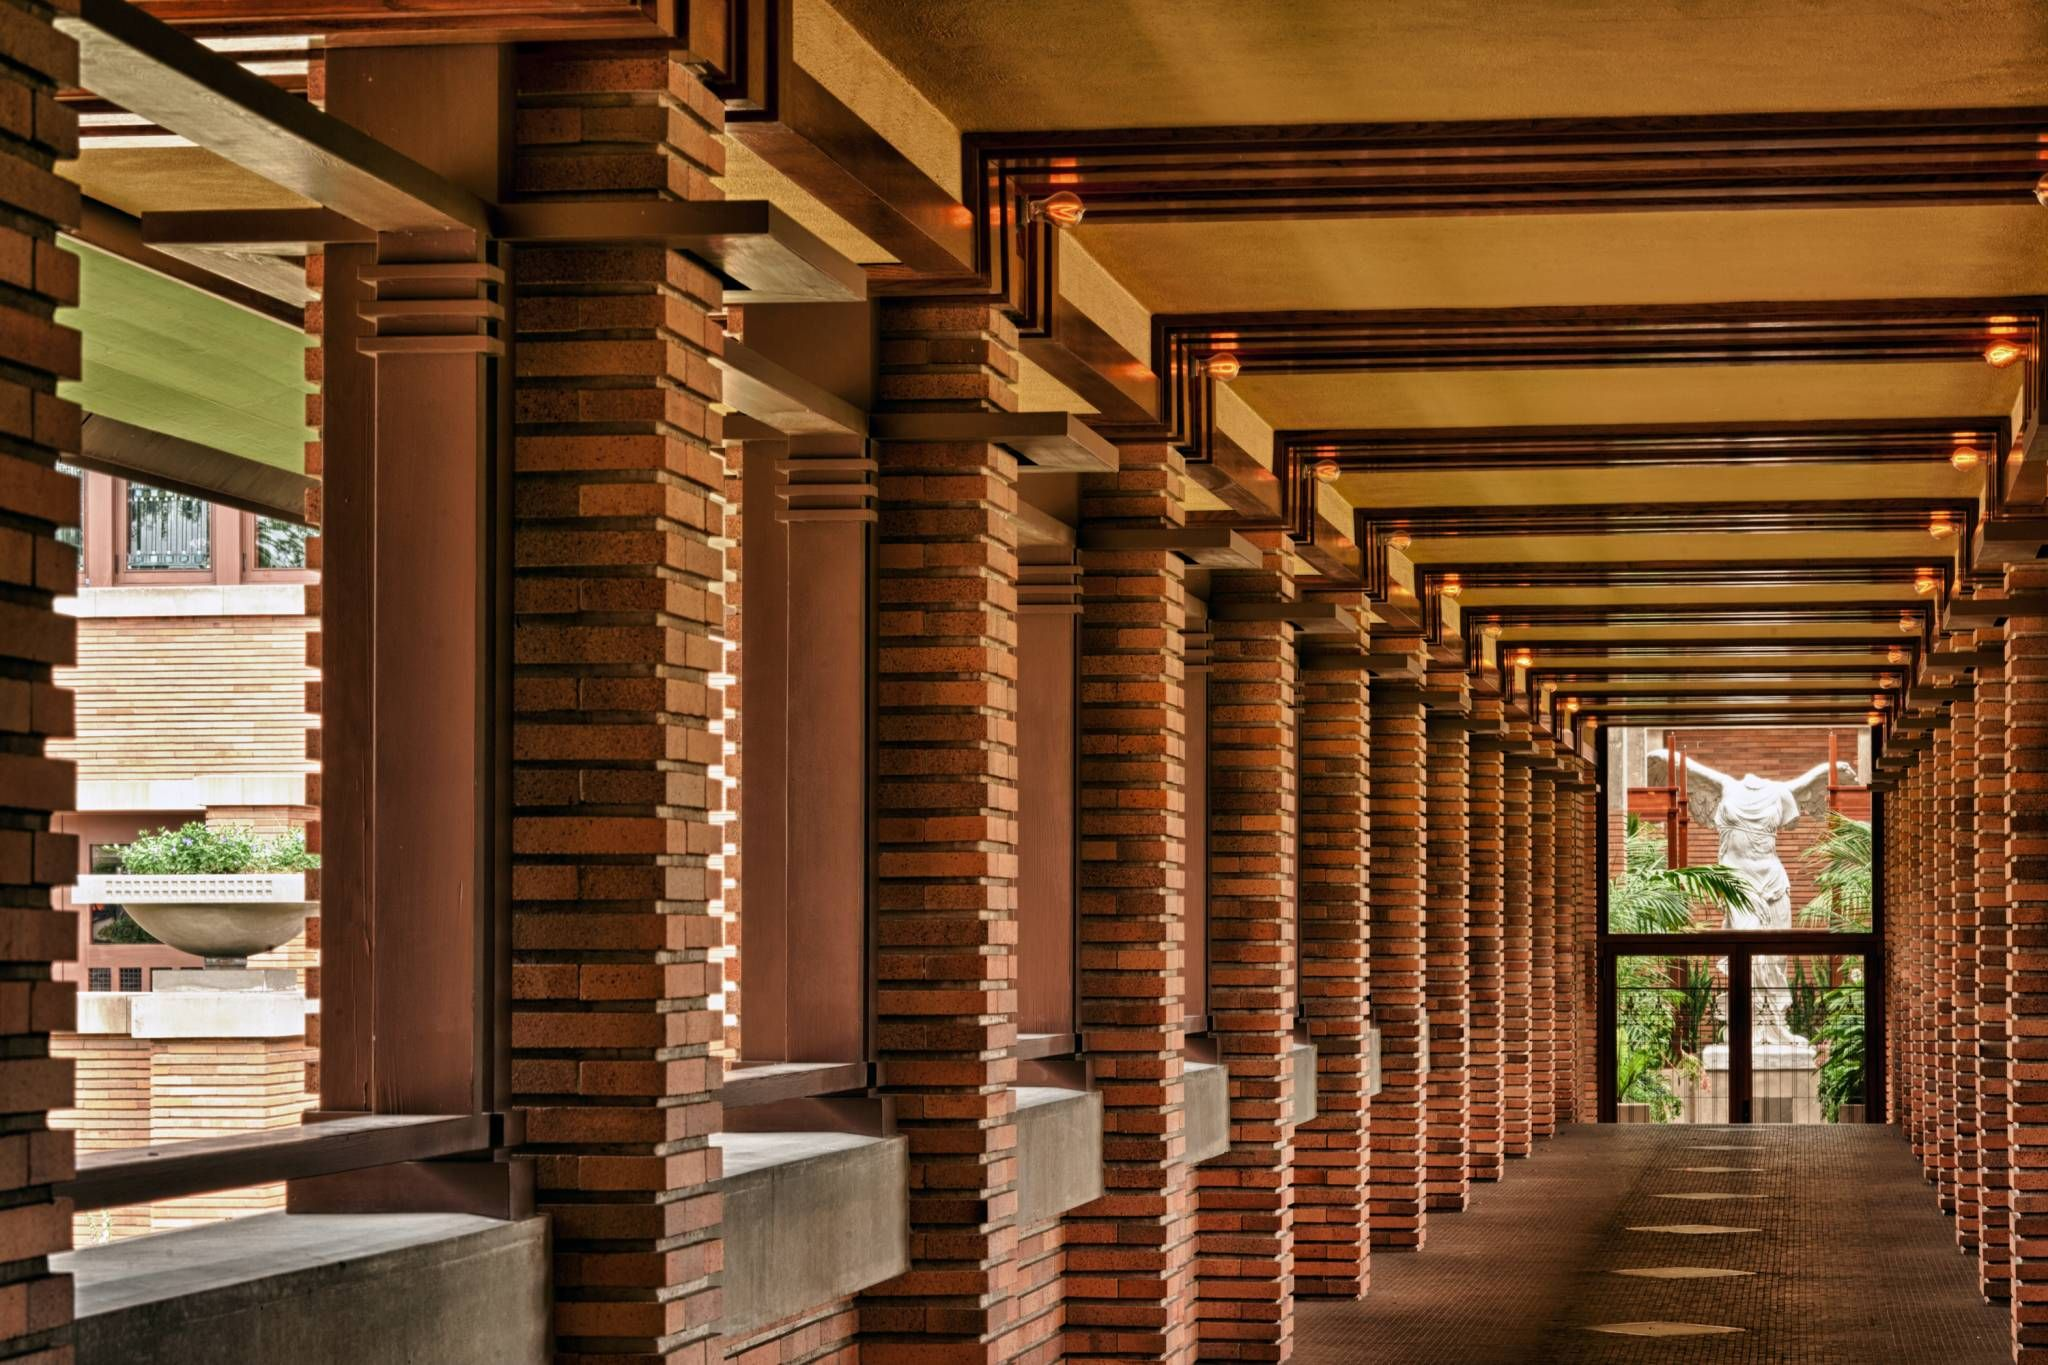 Darwin Martin House Pergola Frank Lloyd Wright Design Martin House Darwin Martin House Frank Lloyd Wright